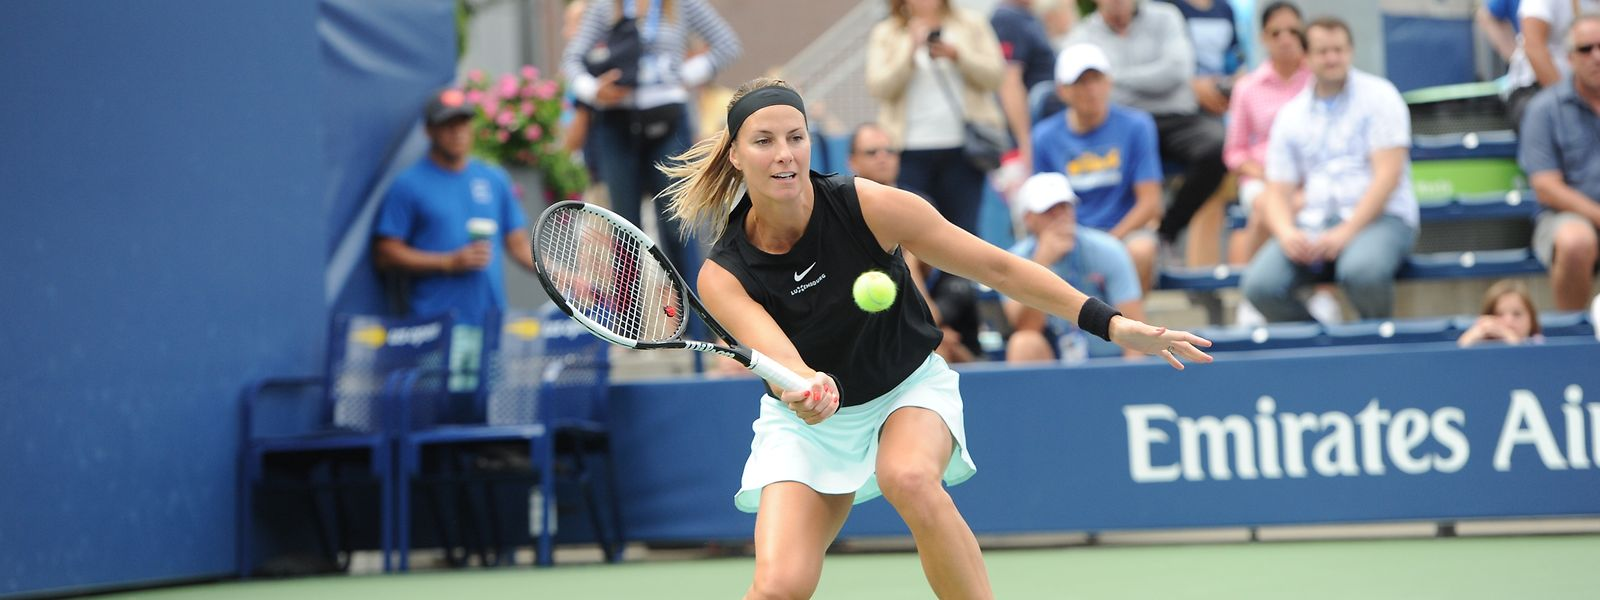 Mandy Minella, hier bei den US Open 2019, gewann den Doppeltitel in Montreux mit Xenia Knoll.